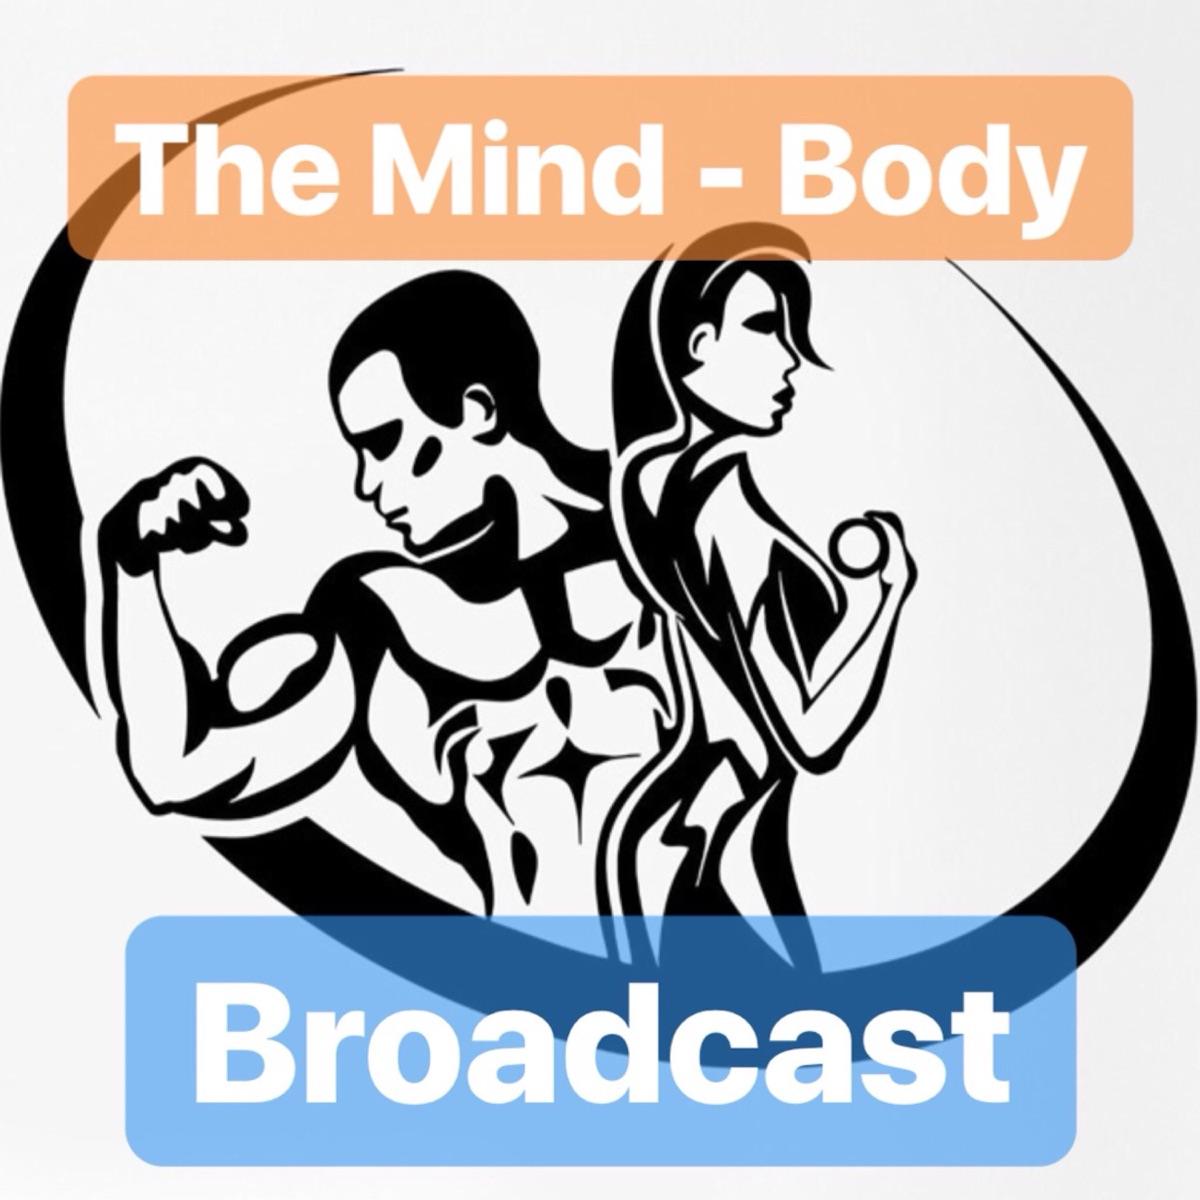 The Mind - Body Broadcast